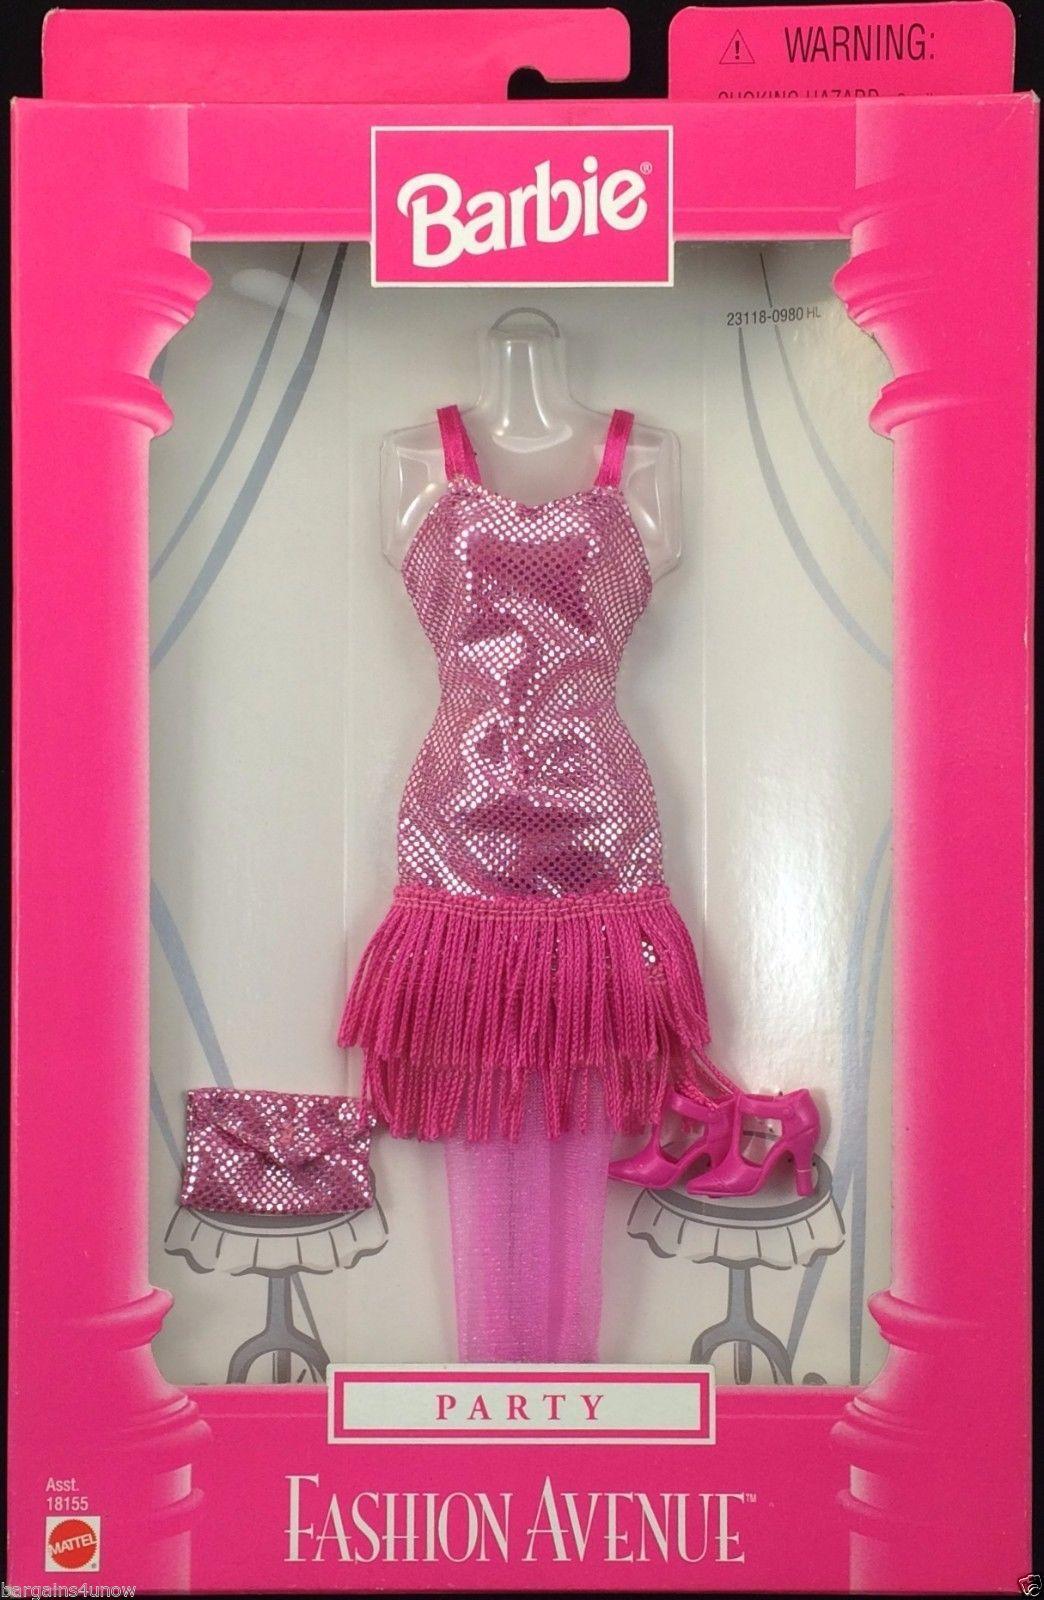 Barbie Party Fashion Avenue Pink Silver Flapper Dress Hosiery Shoes ...